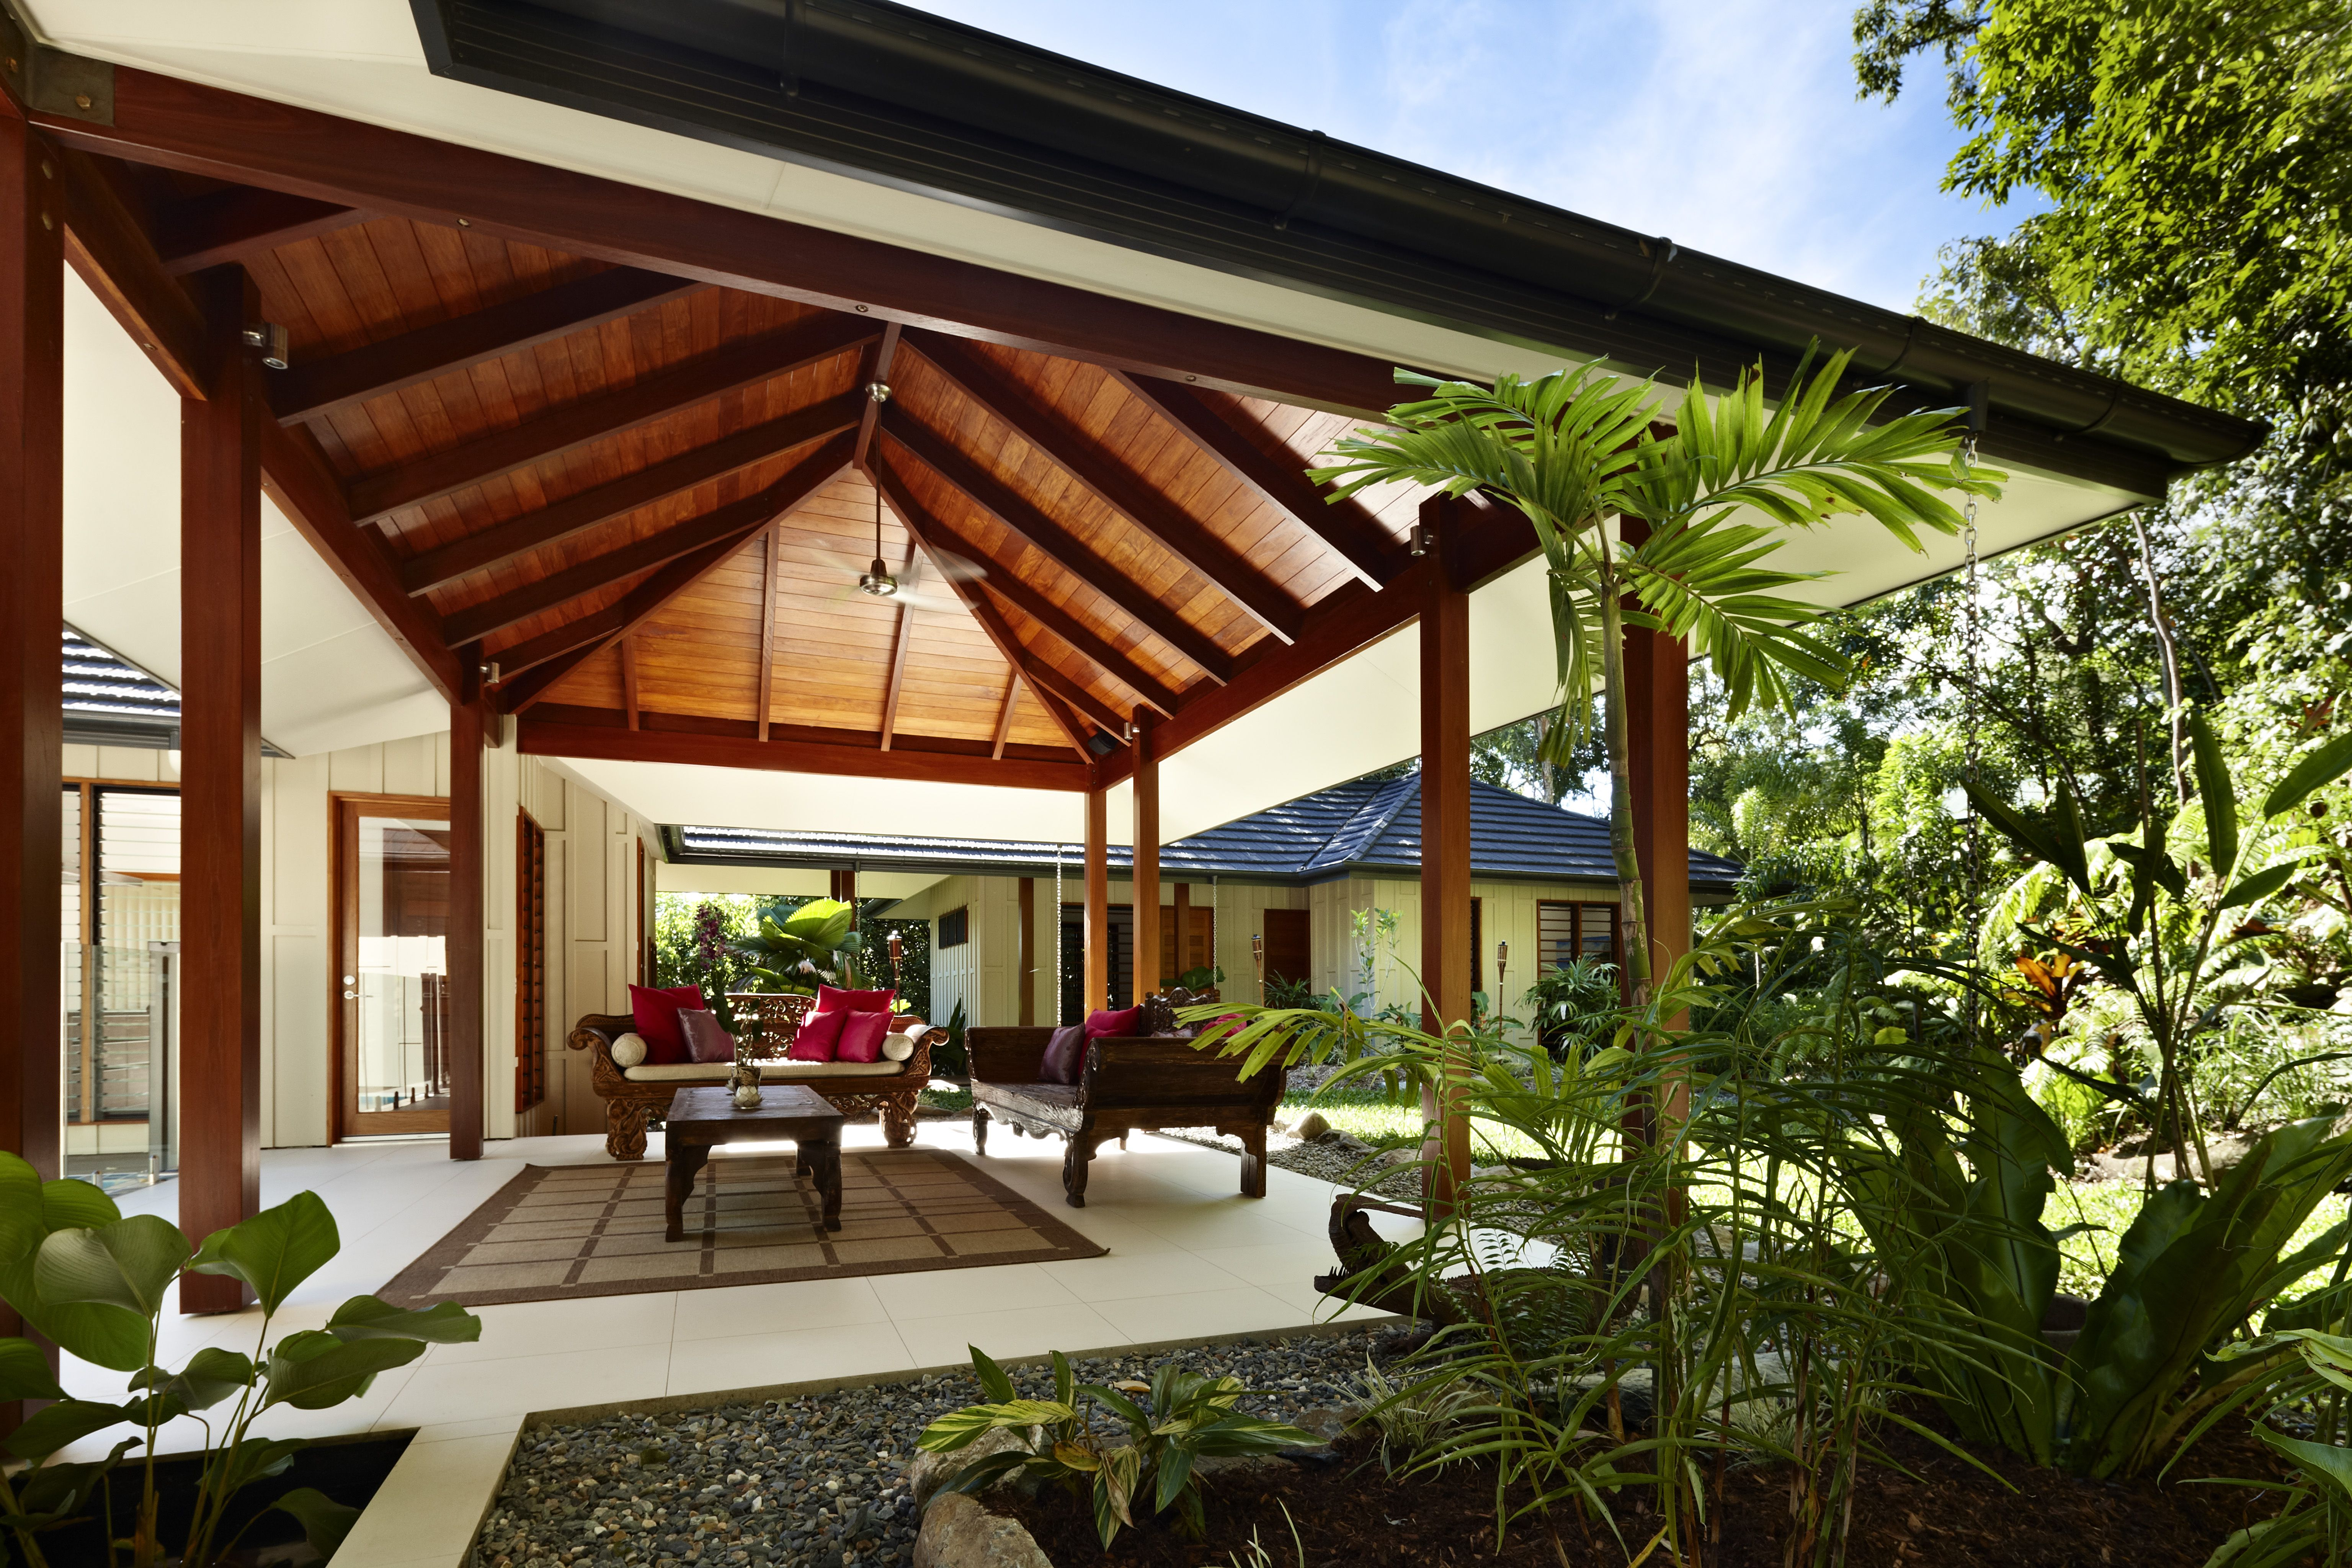 Home Design Ideas Pictures: Grand Designs Australia: Series 2 · Episode 5 In 2019